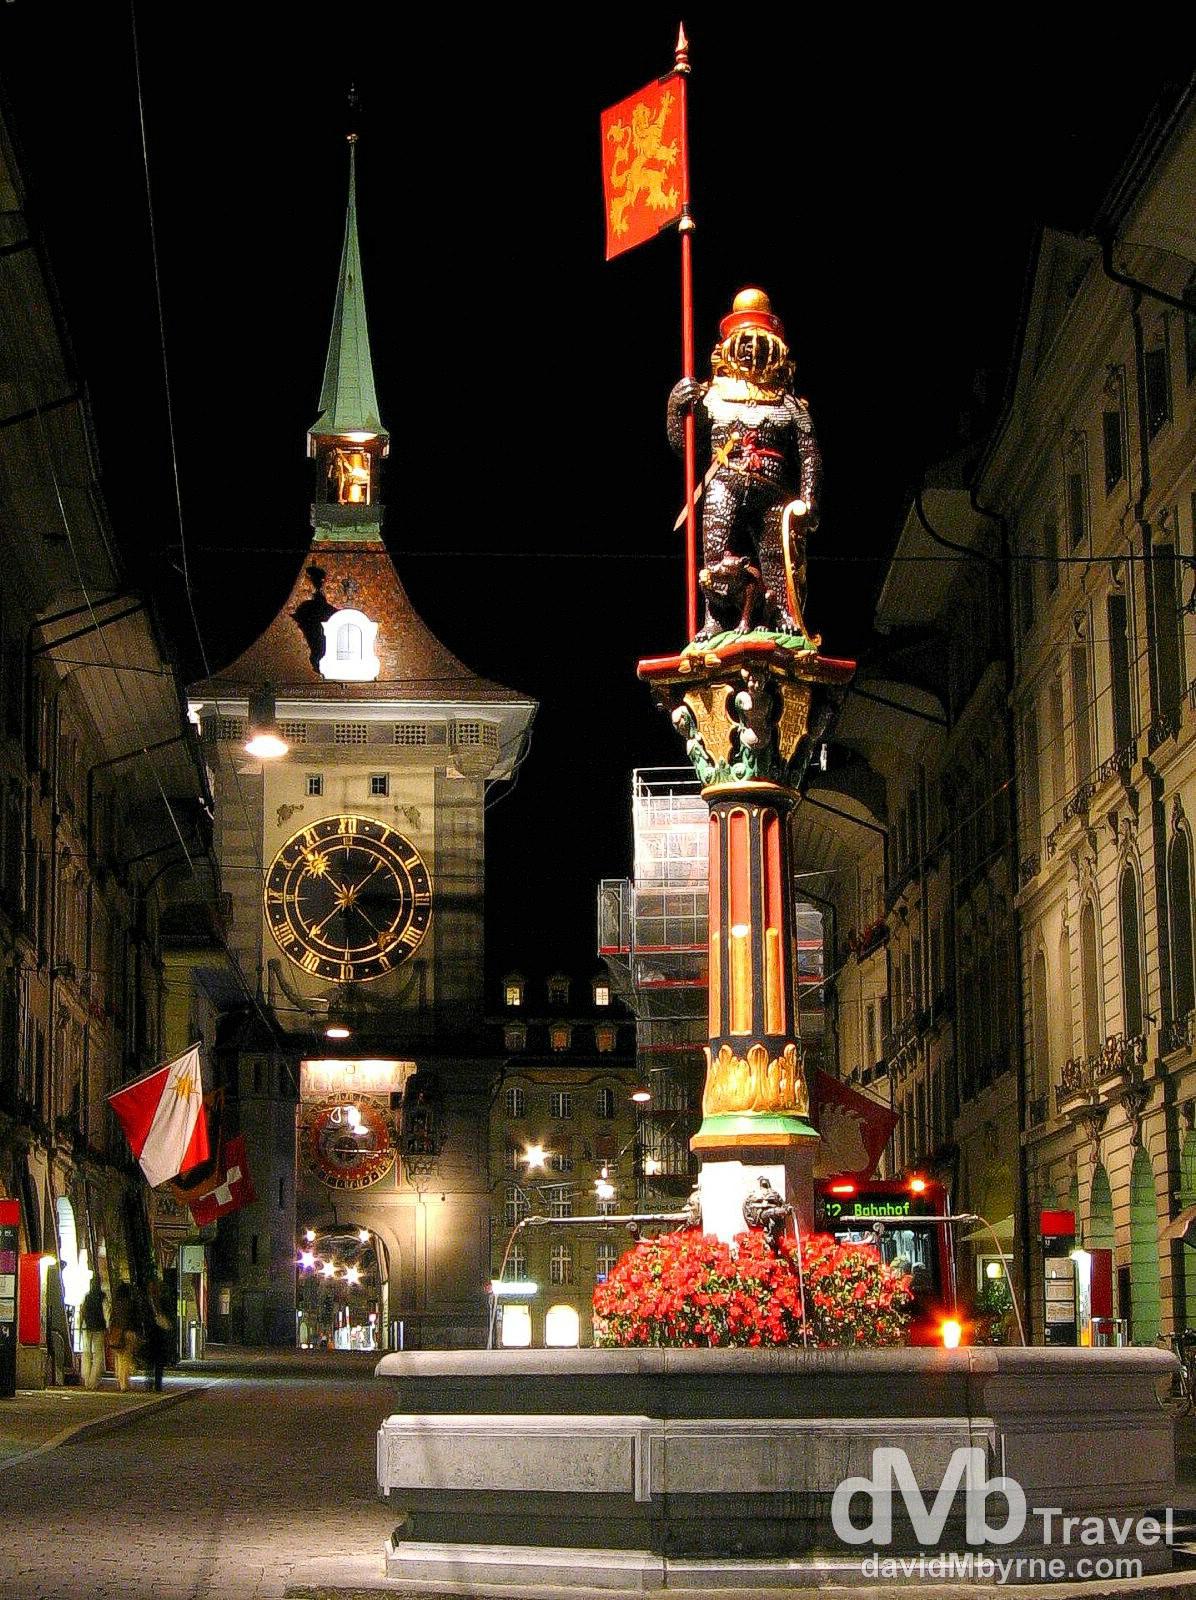 The Kramgasse, Old Town, Bern, Switzerland.